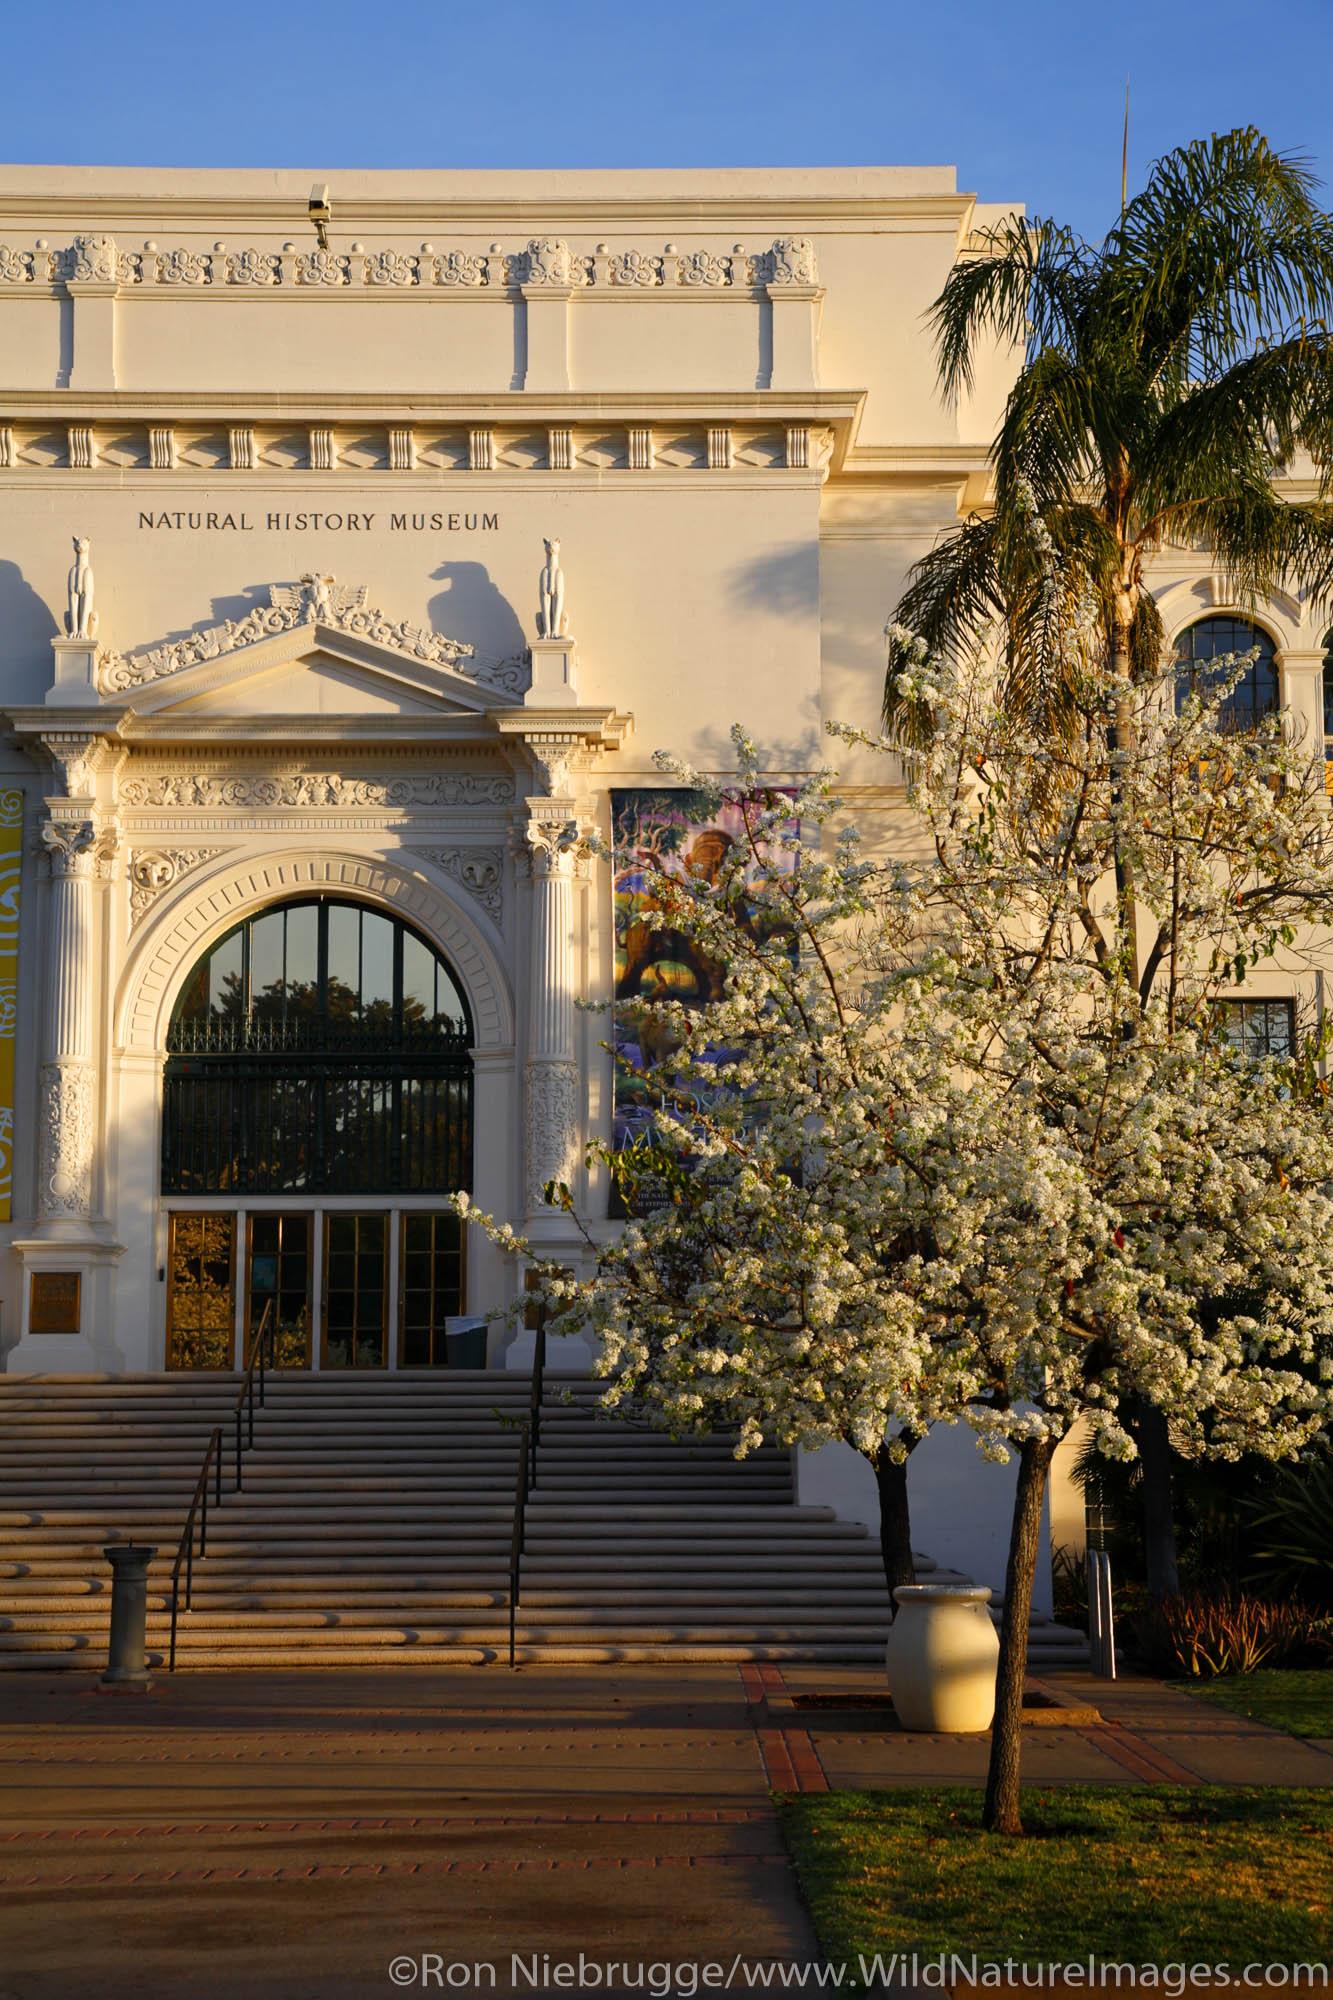 The San Diego Natural History Museum, Balboa Park, San Diego, California.